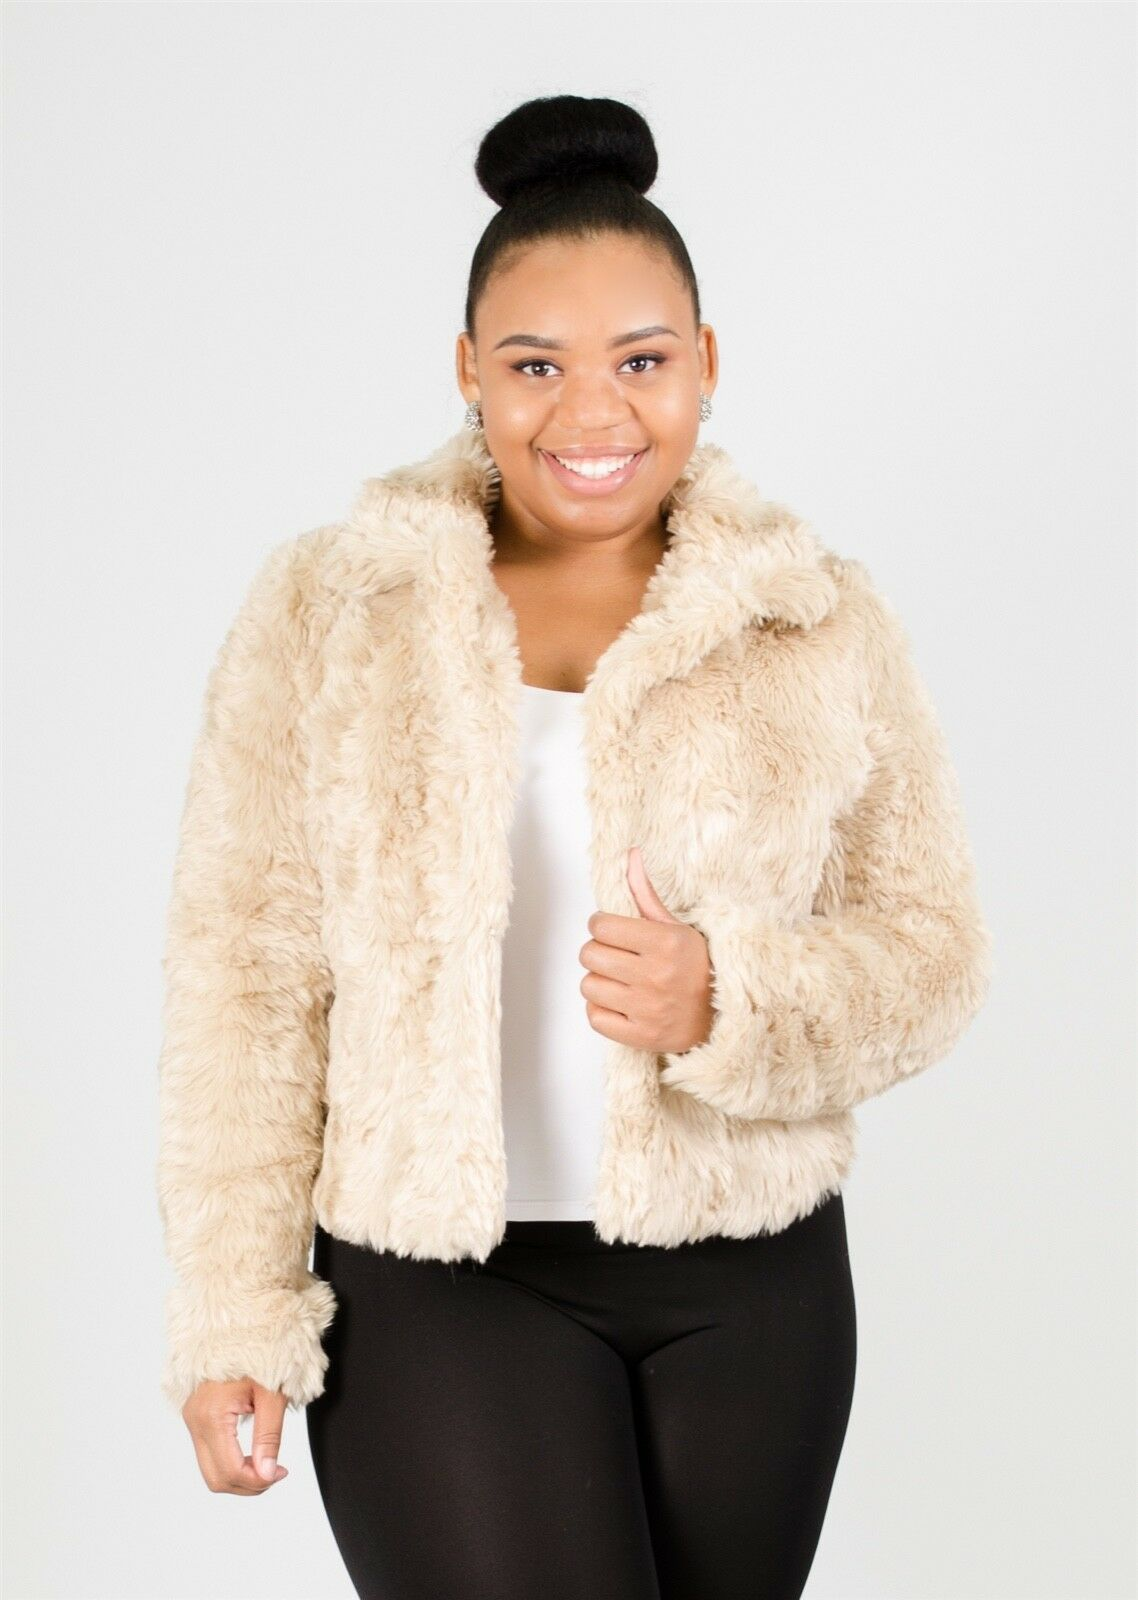 Chic Ladies Faux Fur Short Jacket, Work or Play, Black